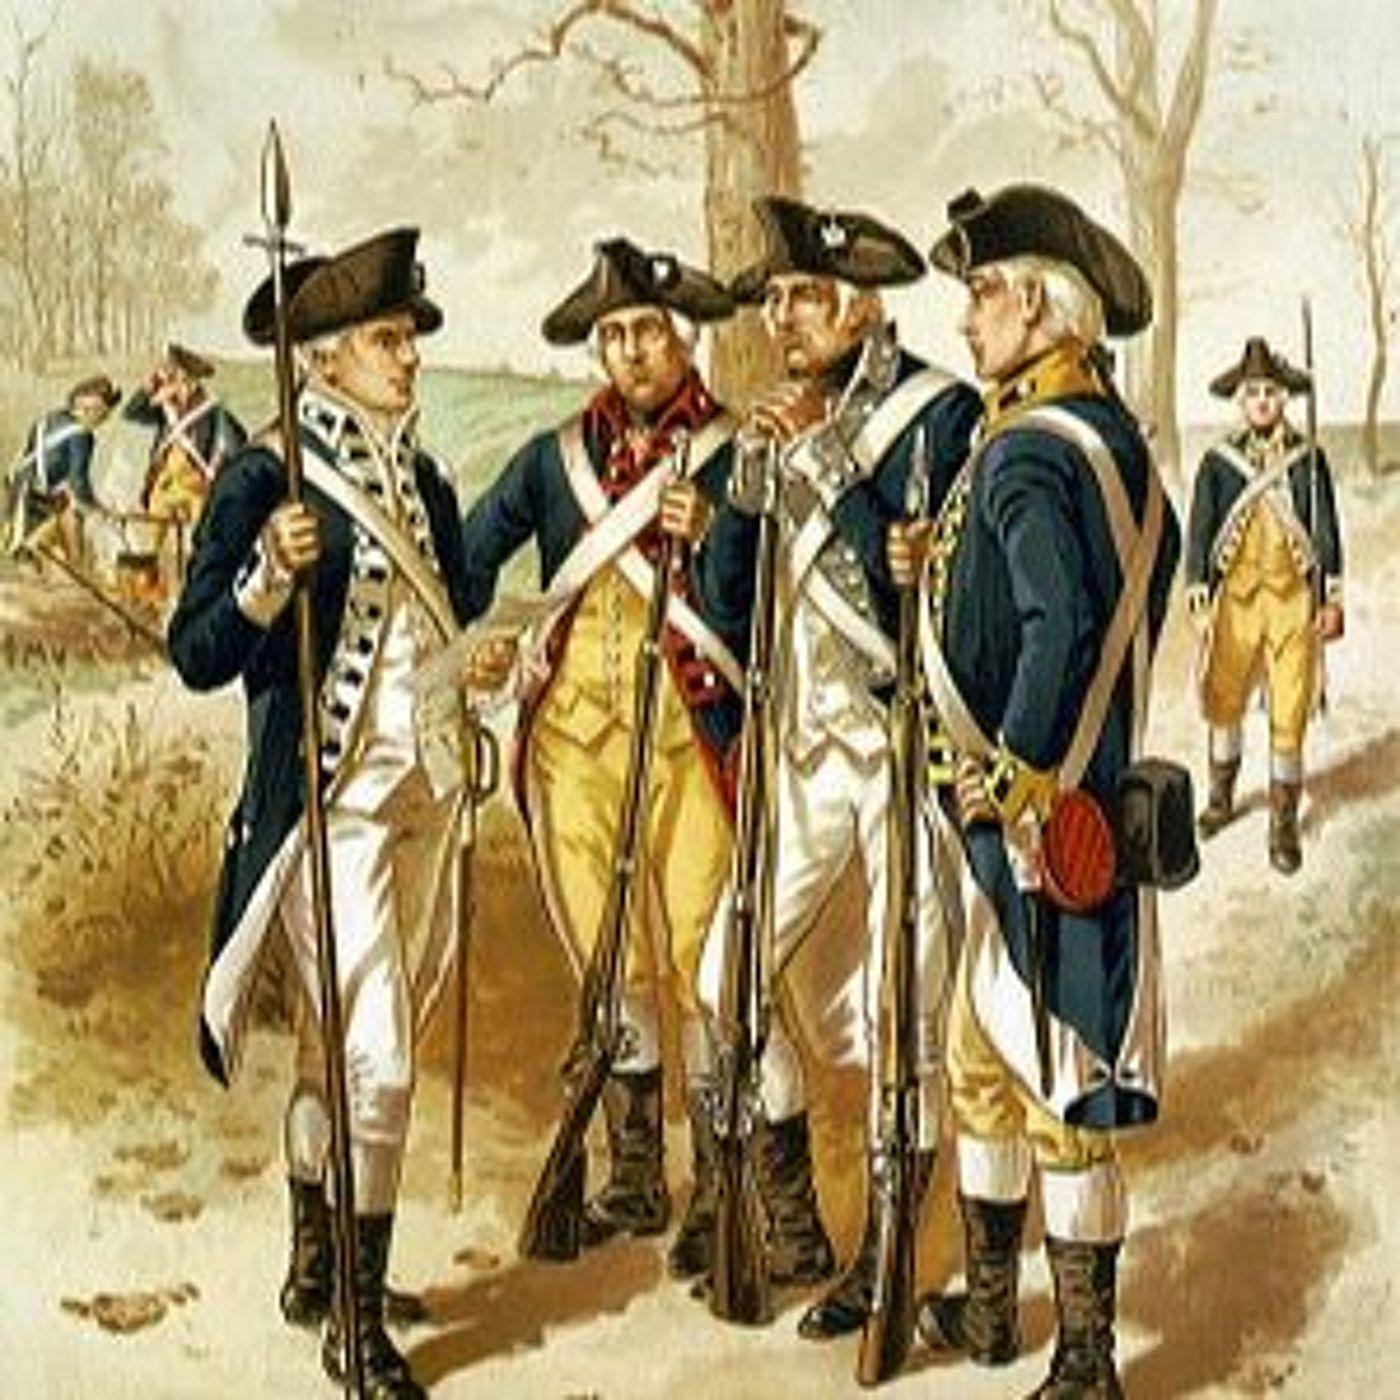 Ep. 45 - Revolutionary War Uniforms